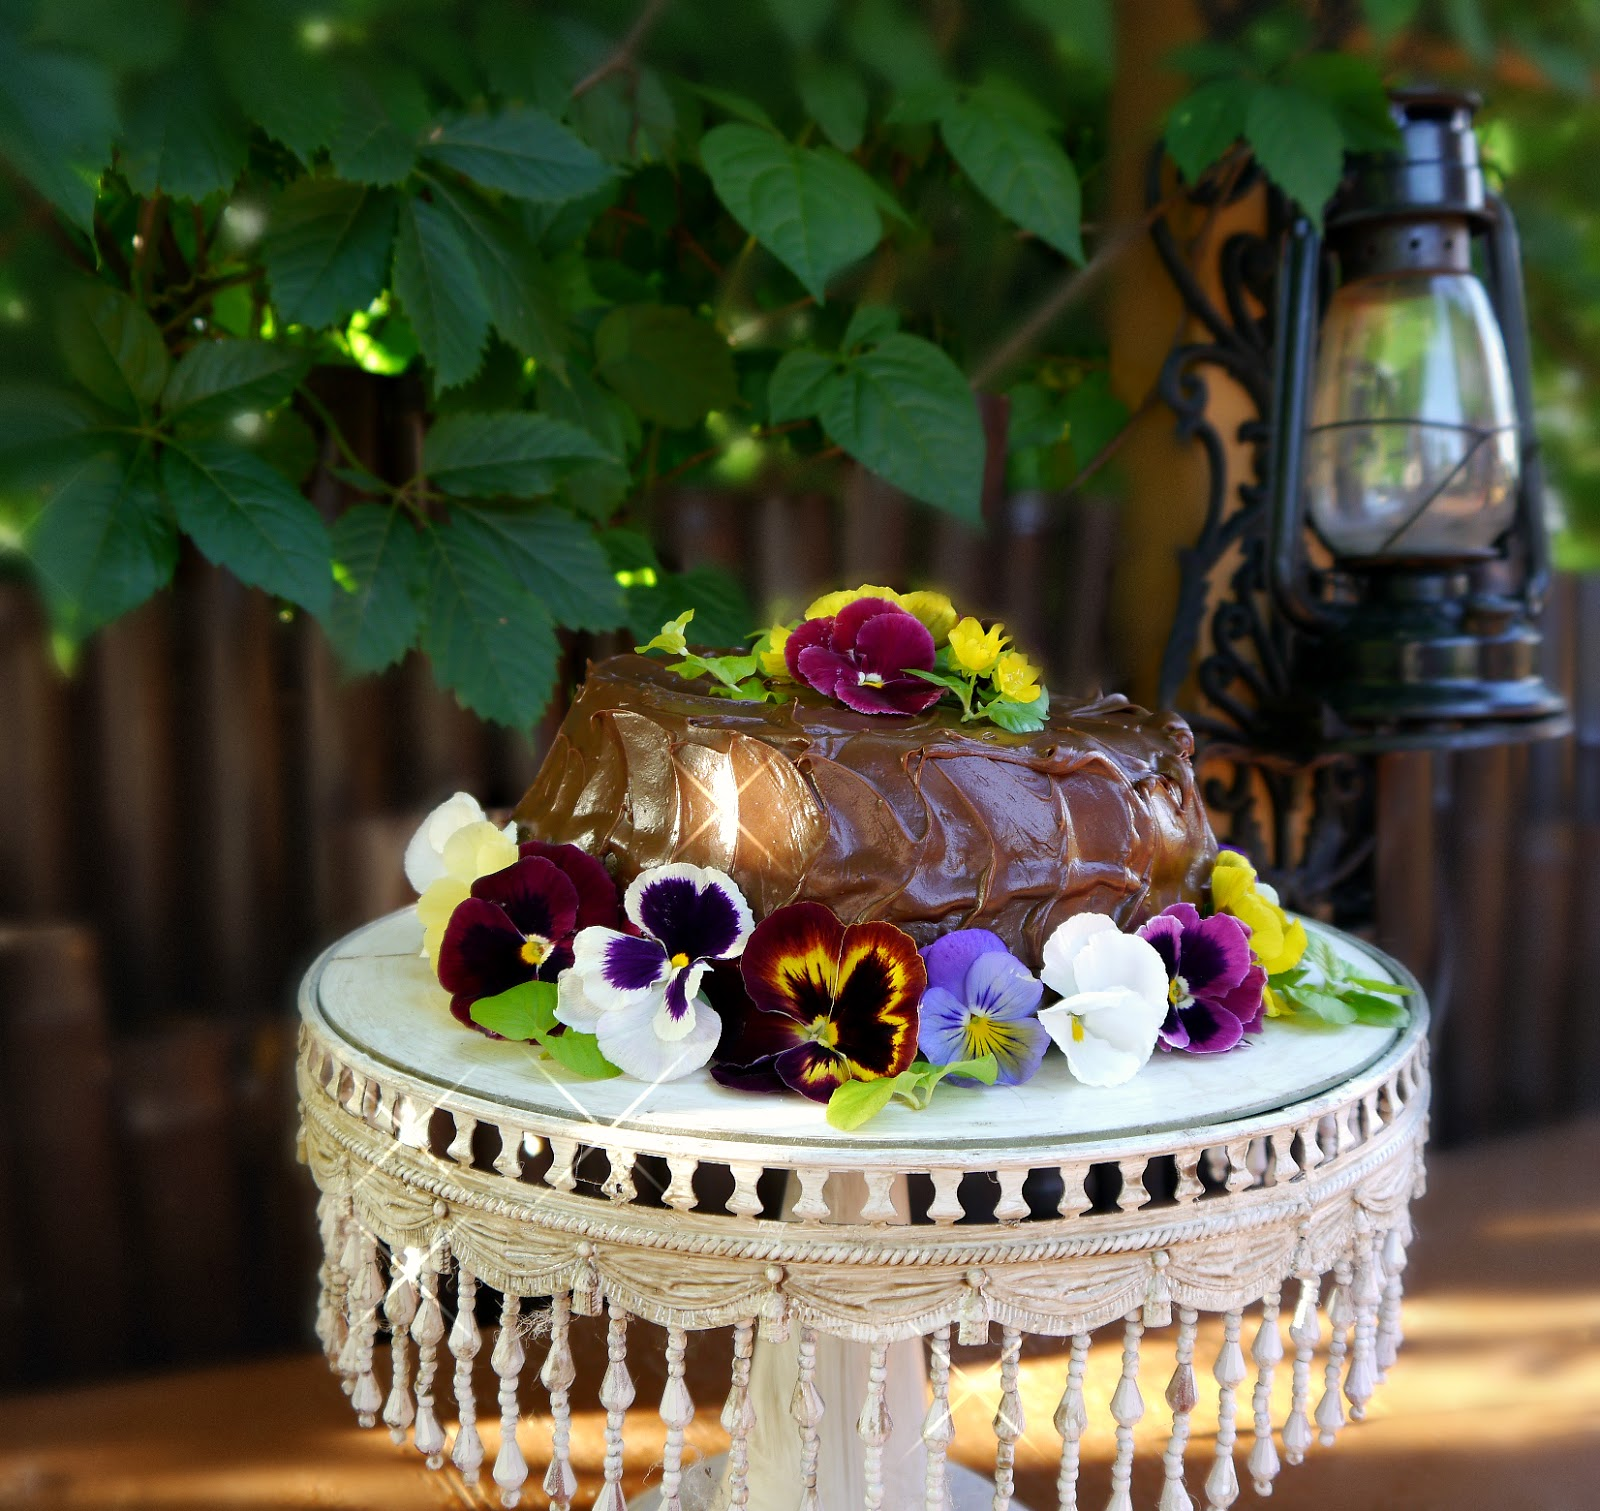 Suzy Homefaker No Egg Chocolate Cake Hundred Dollar Cake